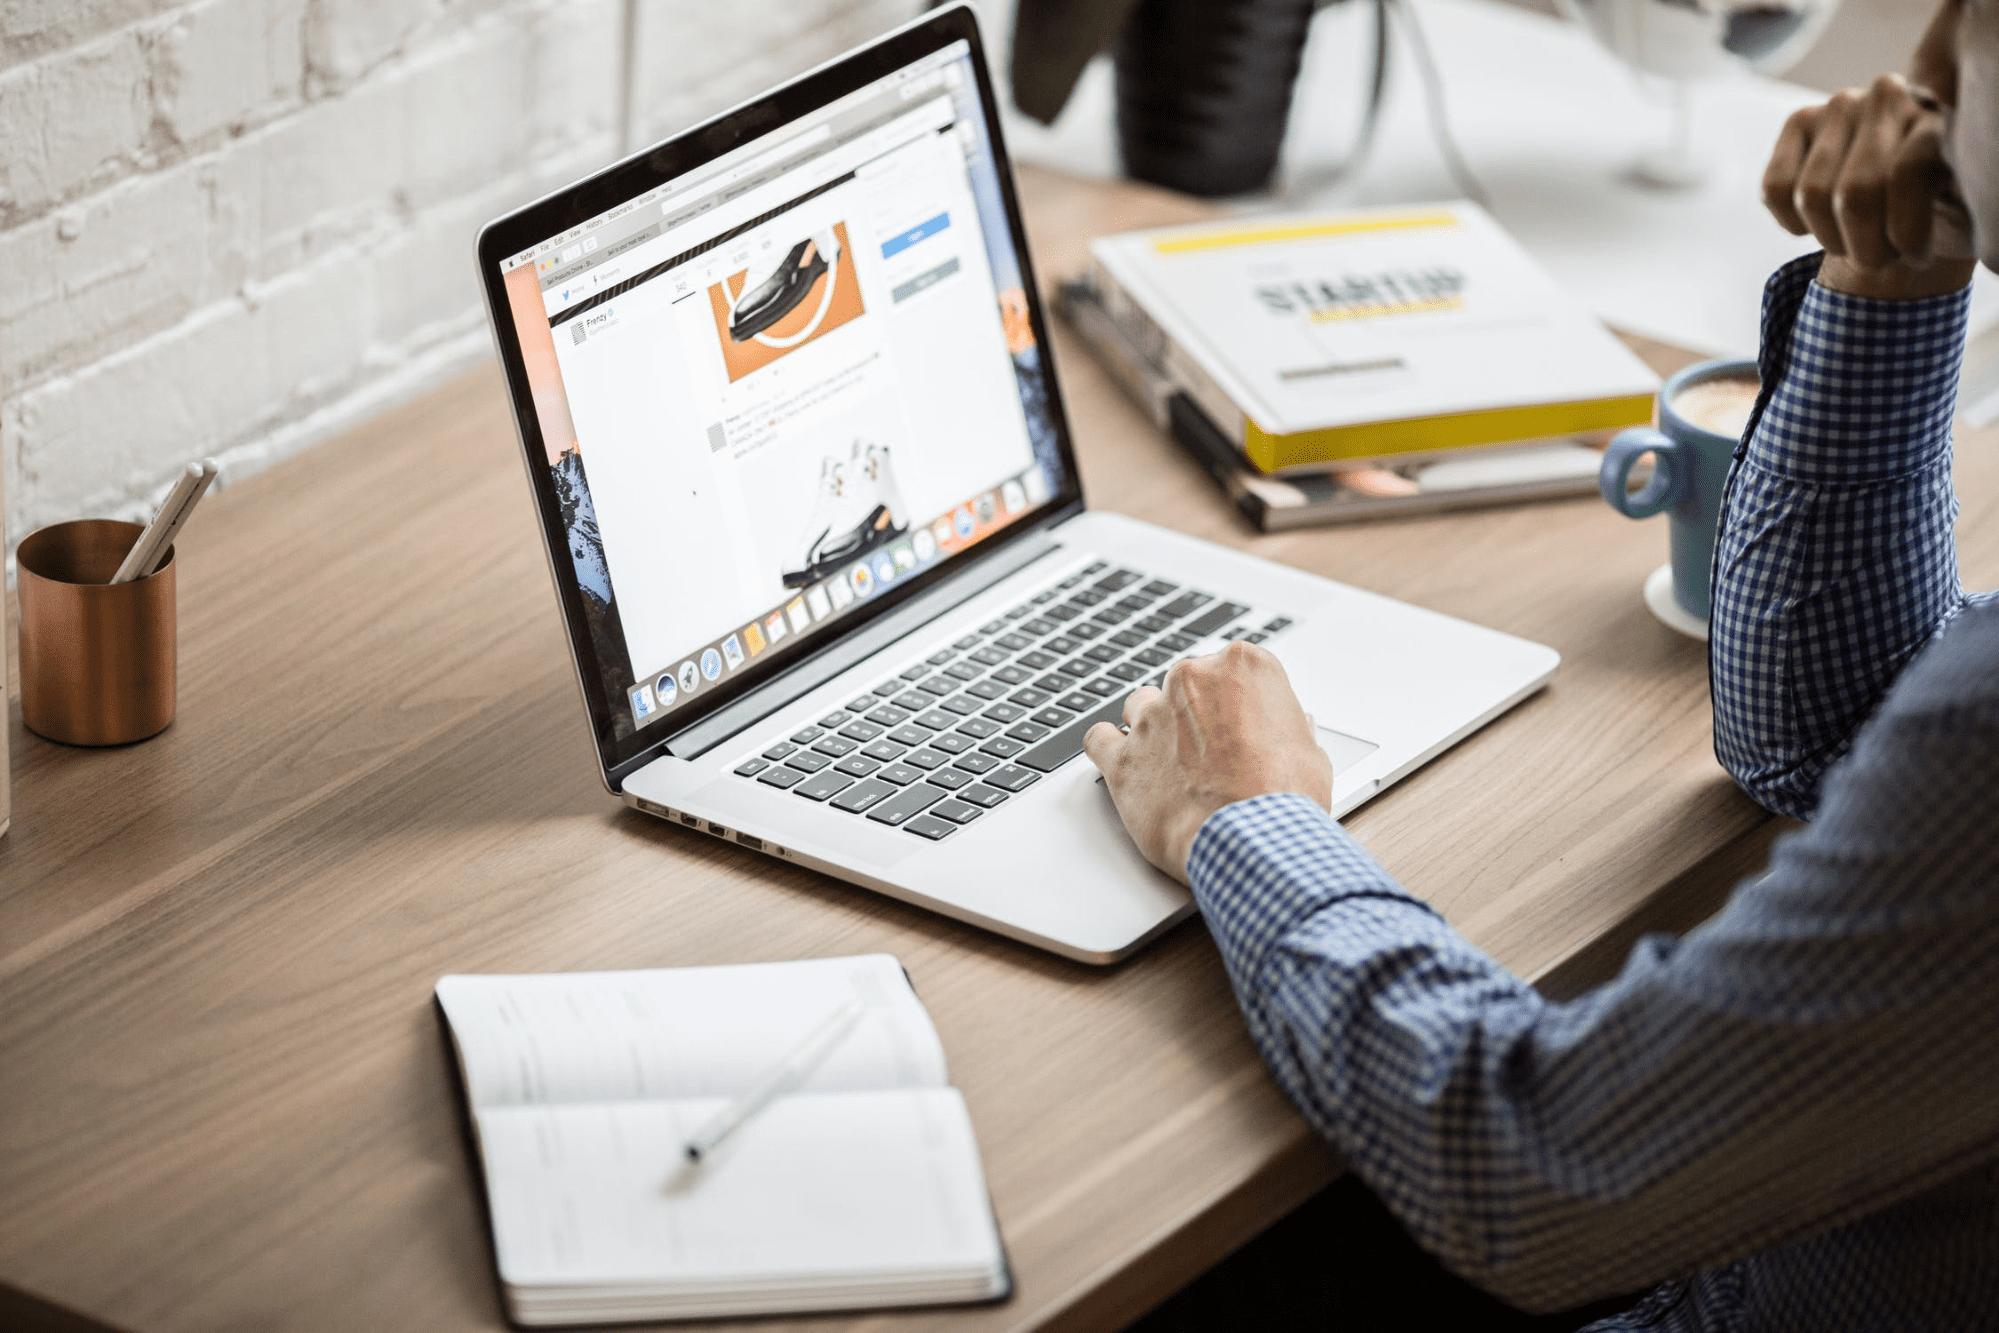 Employee working on laptop